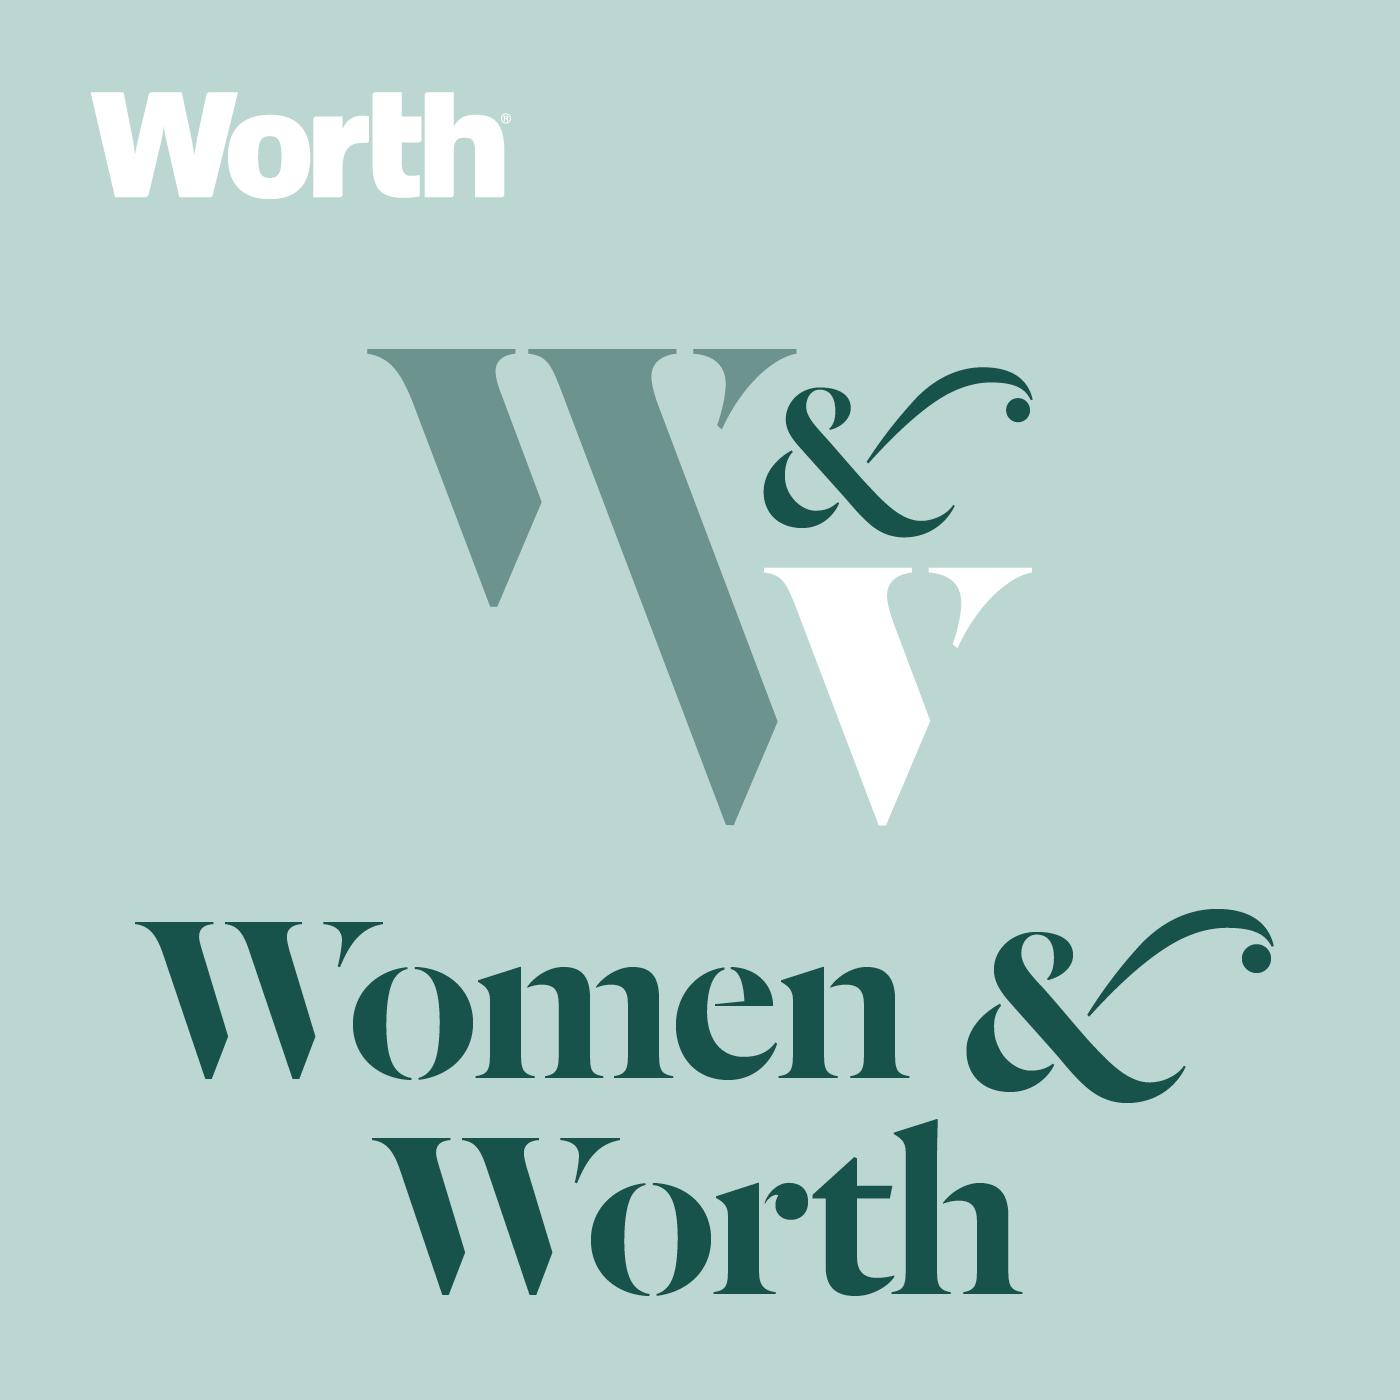 Women & Worth